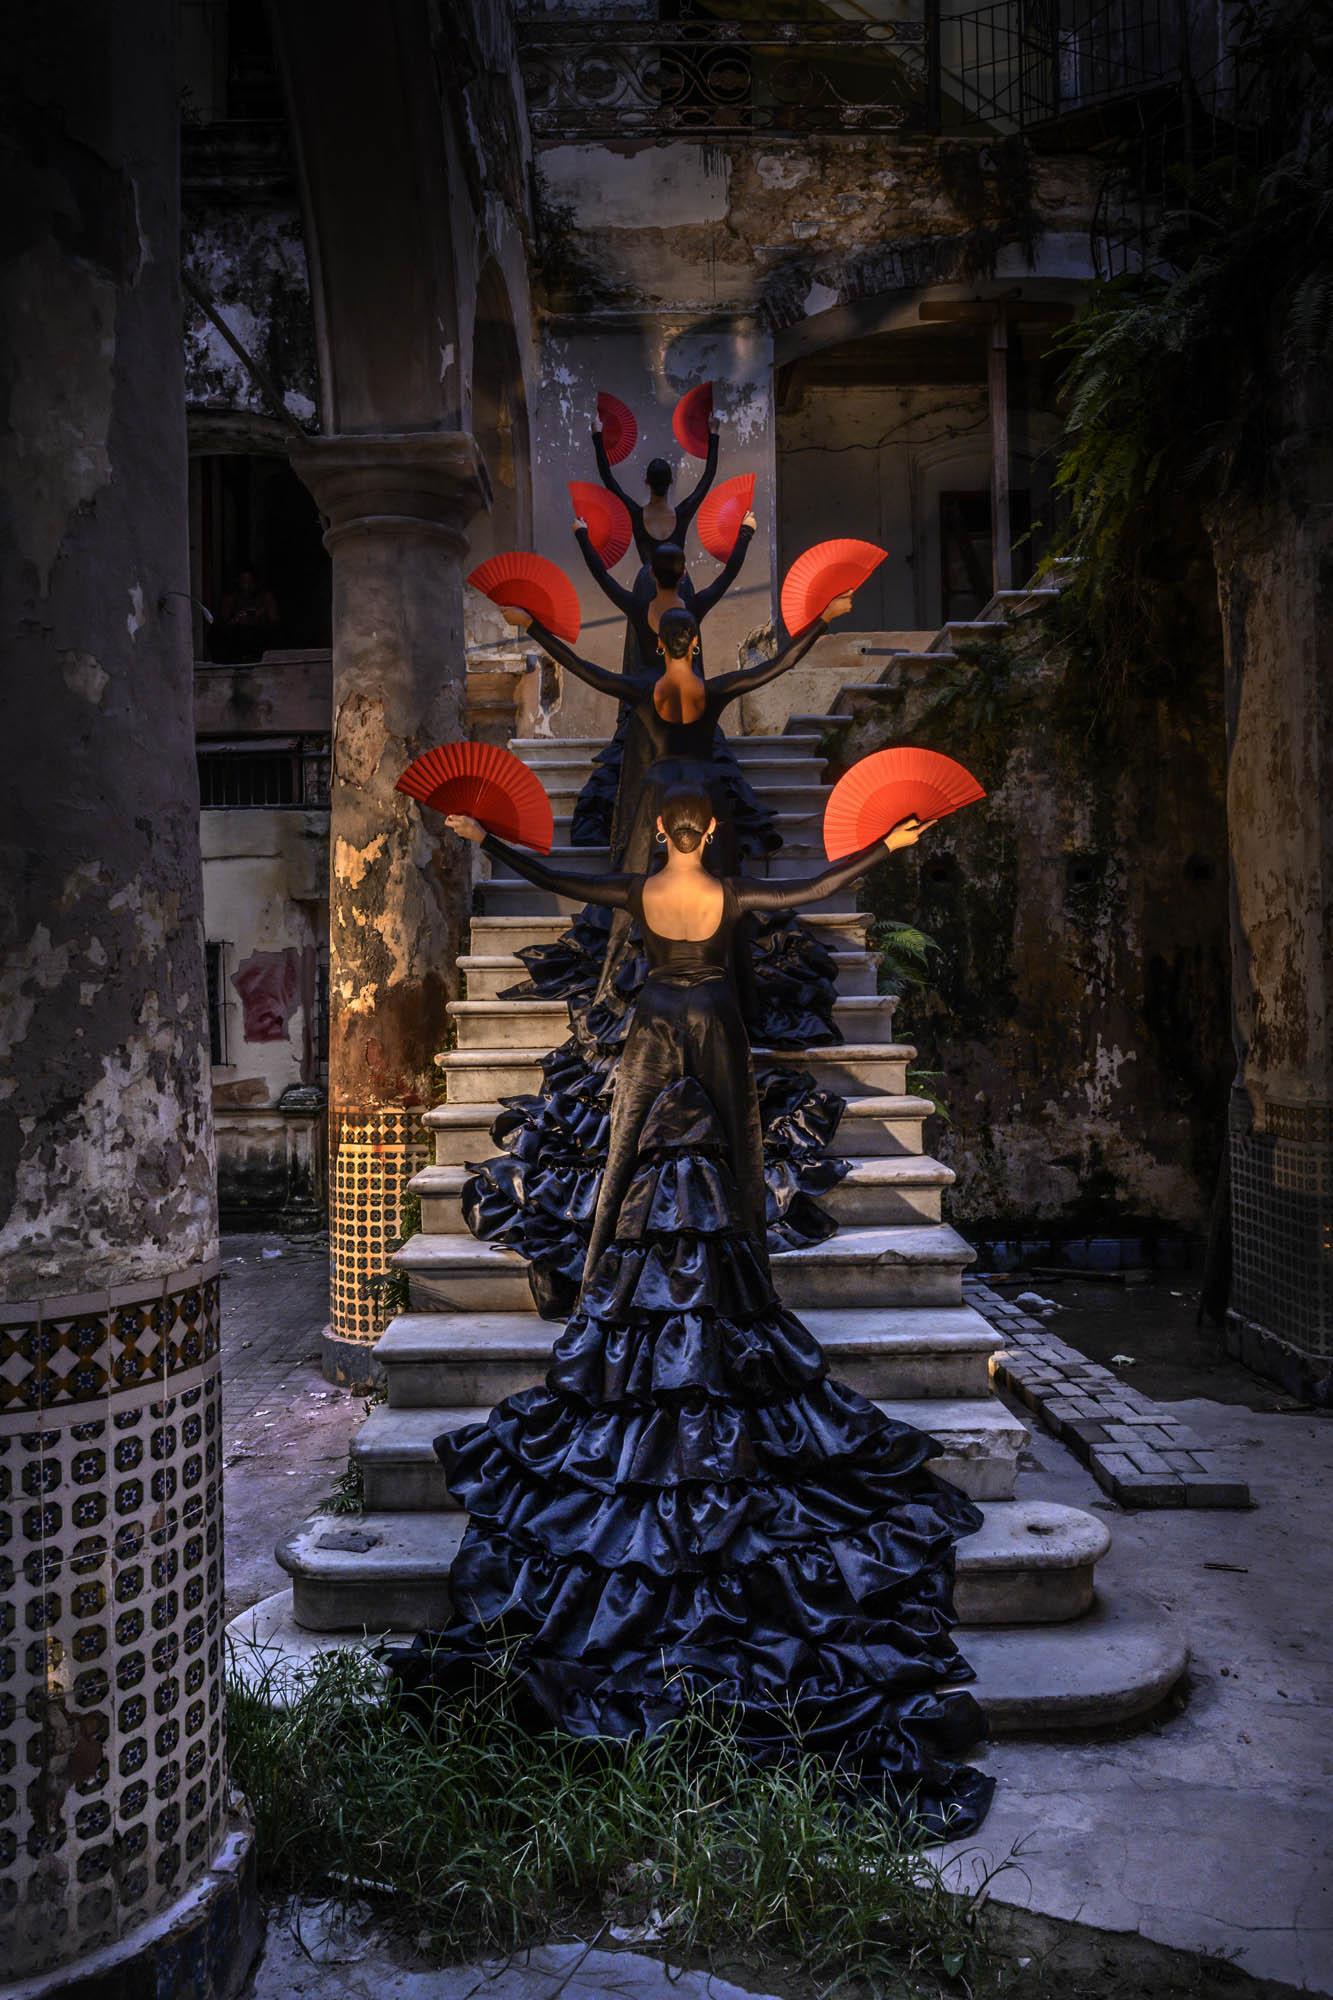 Lizt Alfonso Dance Cuba - Cuba - Hector Garrido, Aerial and human photography